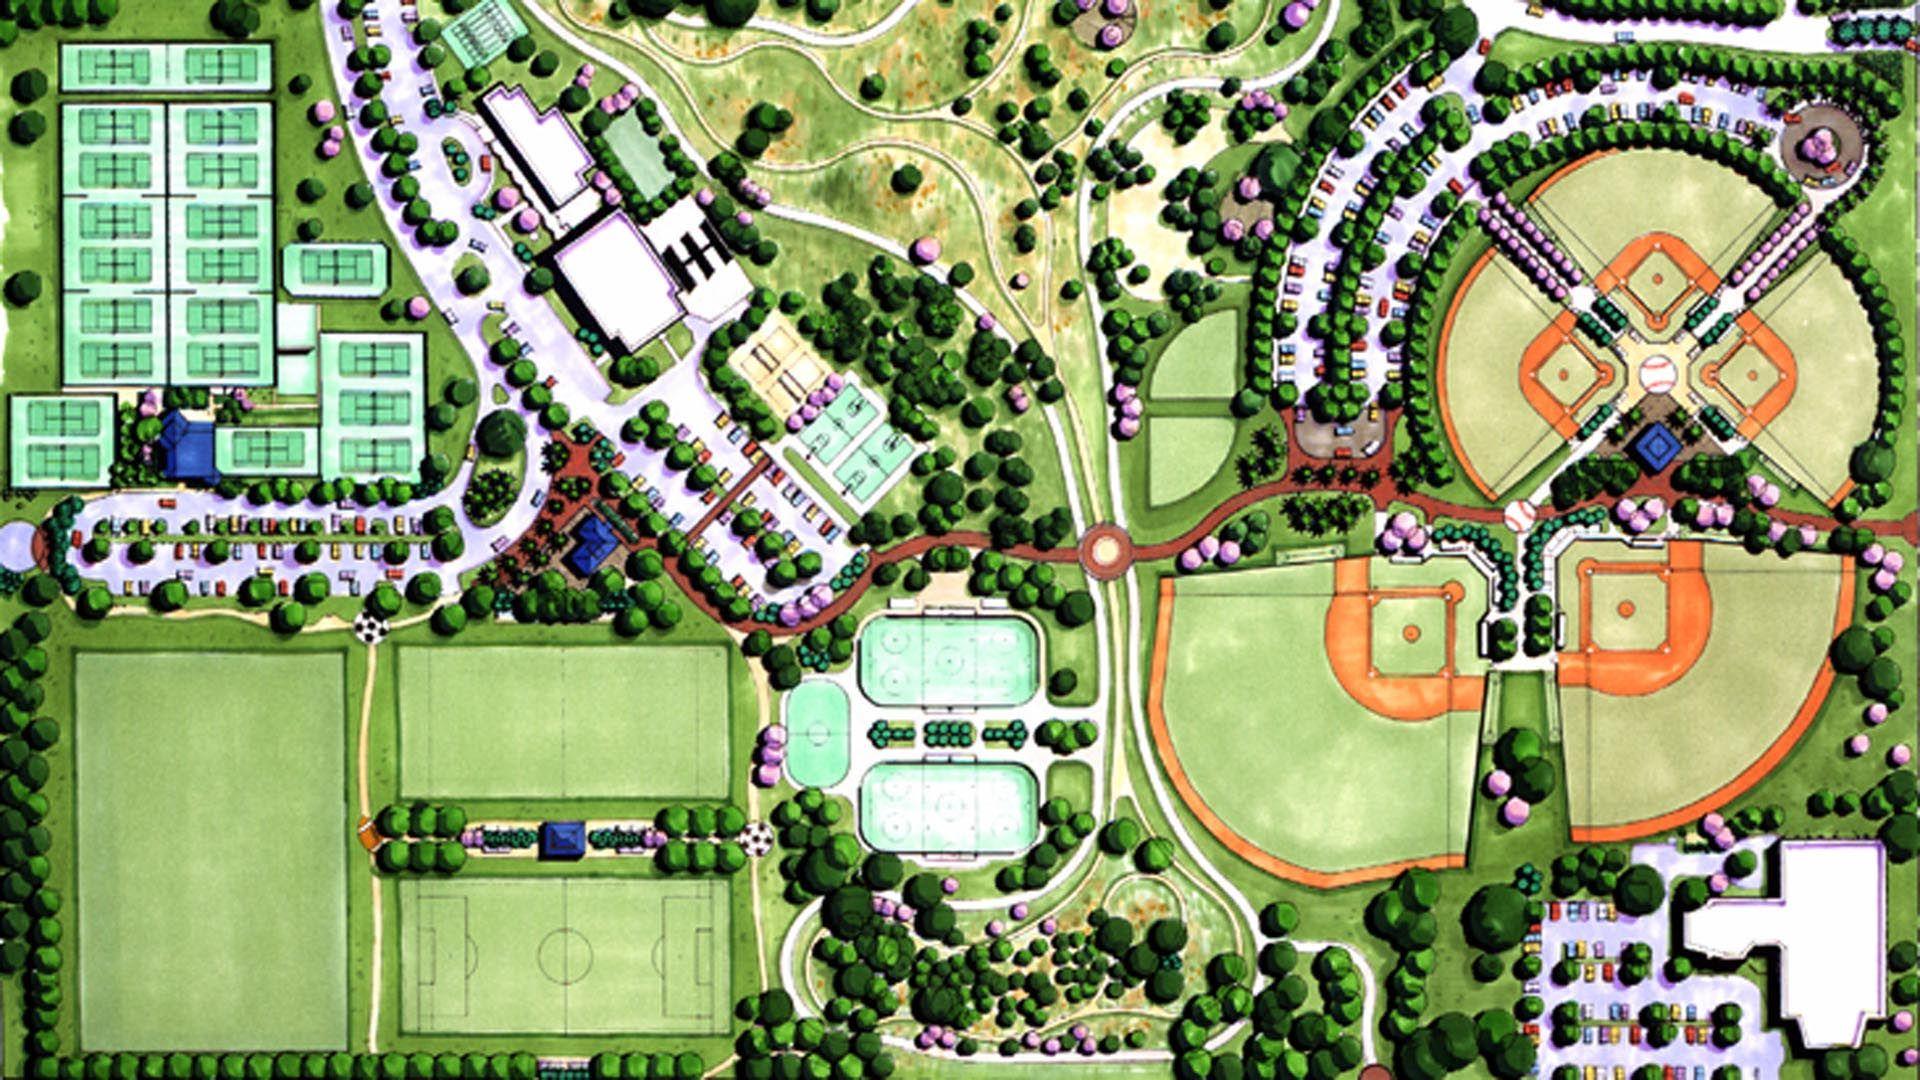 pin by pabloc on tesis pinterest baseball field